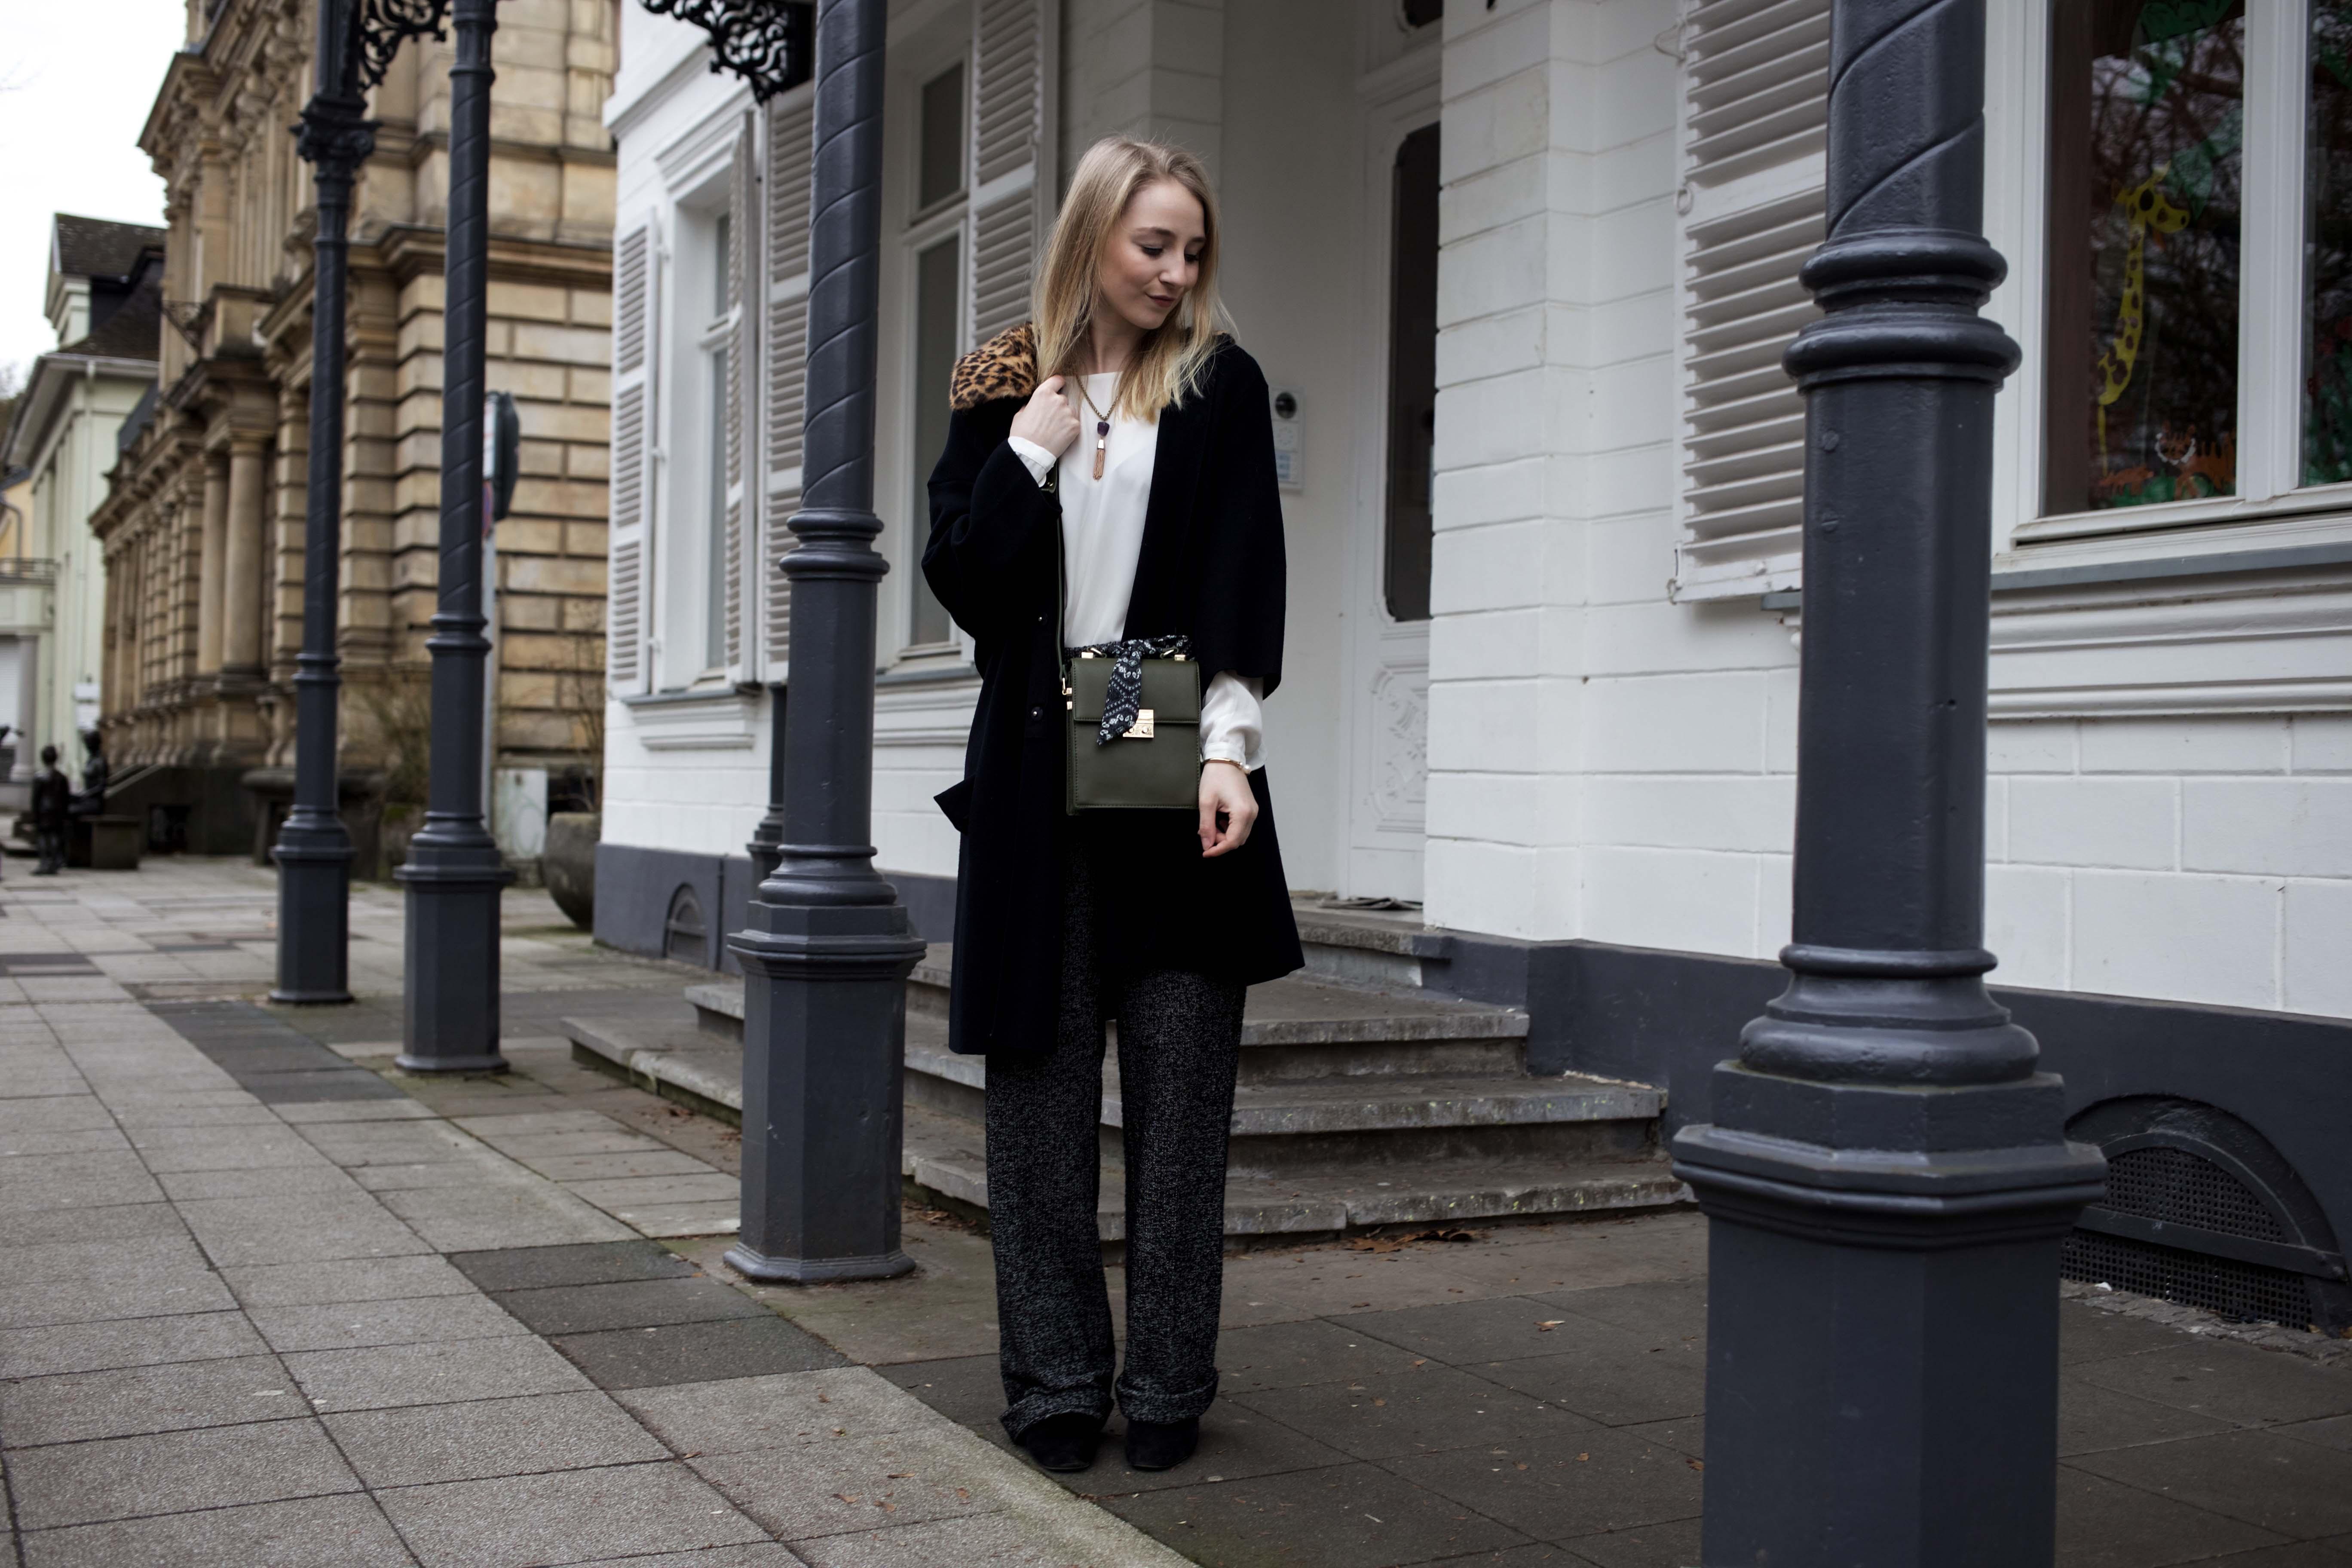 marlenehose-kombinieren-streetstyle-look-modeblog-fashion-blog-cologne-berlin-bonn_0006